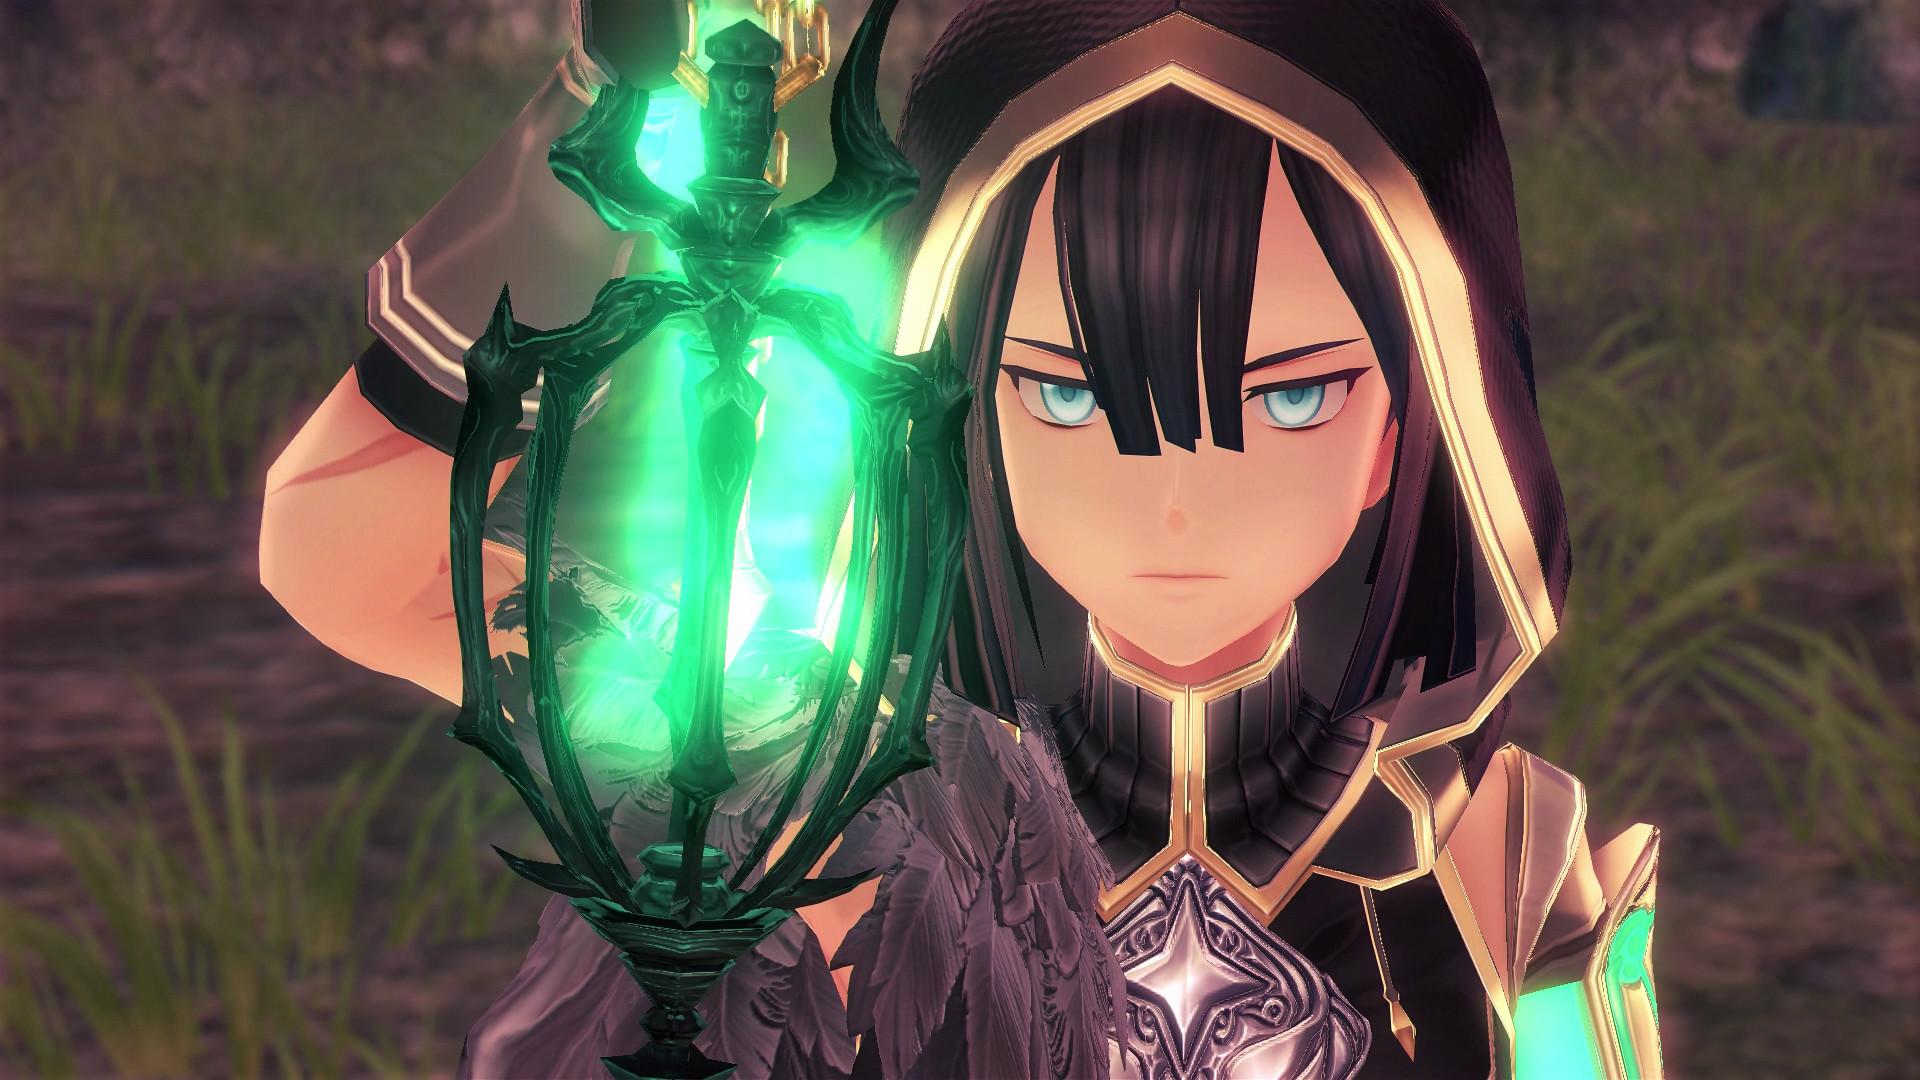 A major character peers into a glowing green lantern in Ys IX: Monstrum Nox.